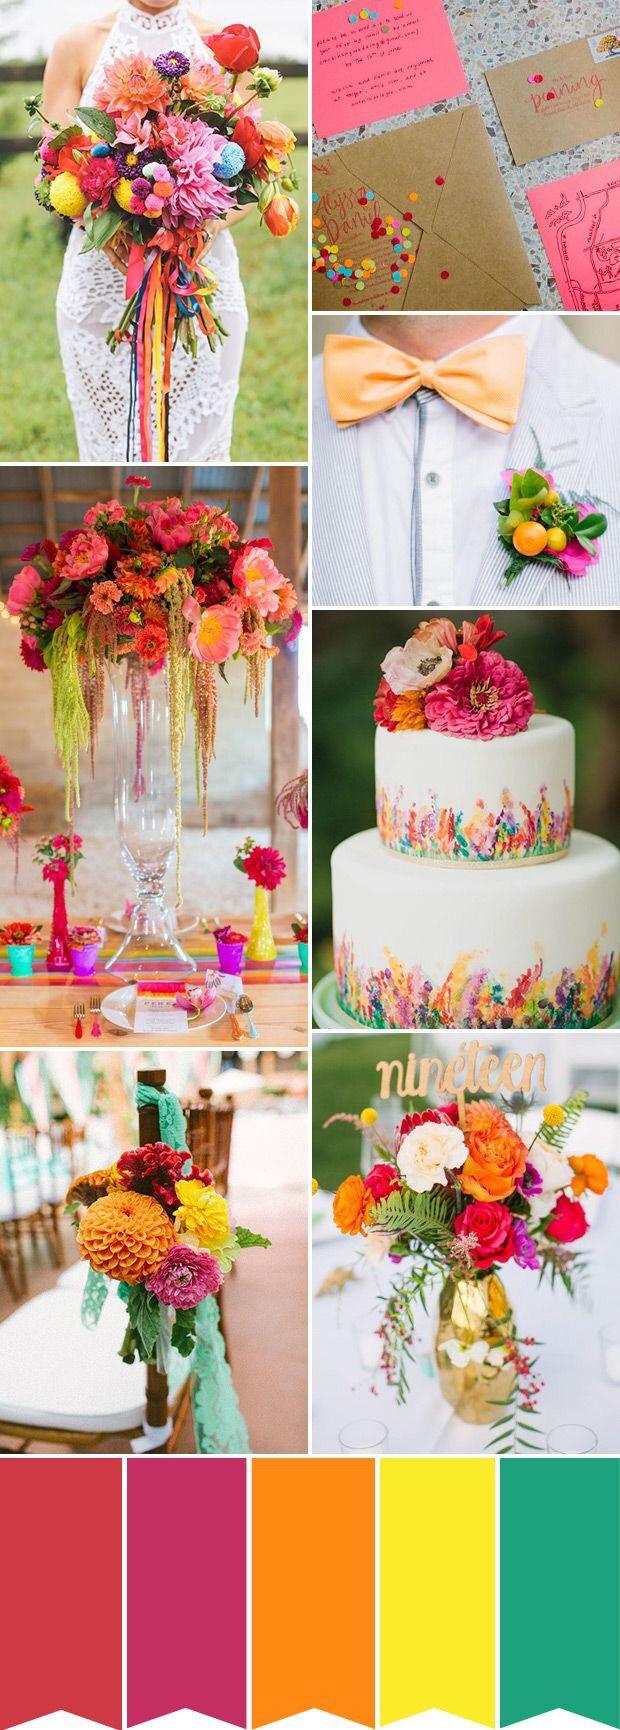 Colorful Weddings Wisconsin Summer Wedding Neira Event Group Fun Colorful Weddings Wisconsin Wedding Colors Wisconsin Wedding Planner